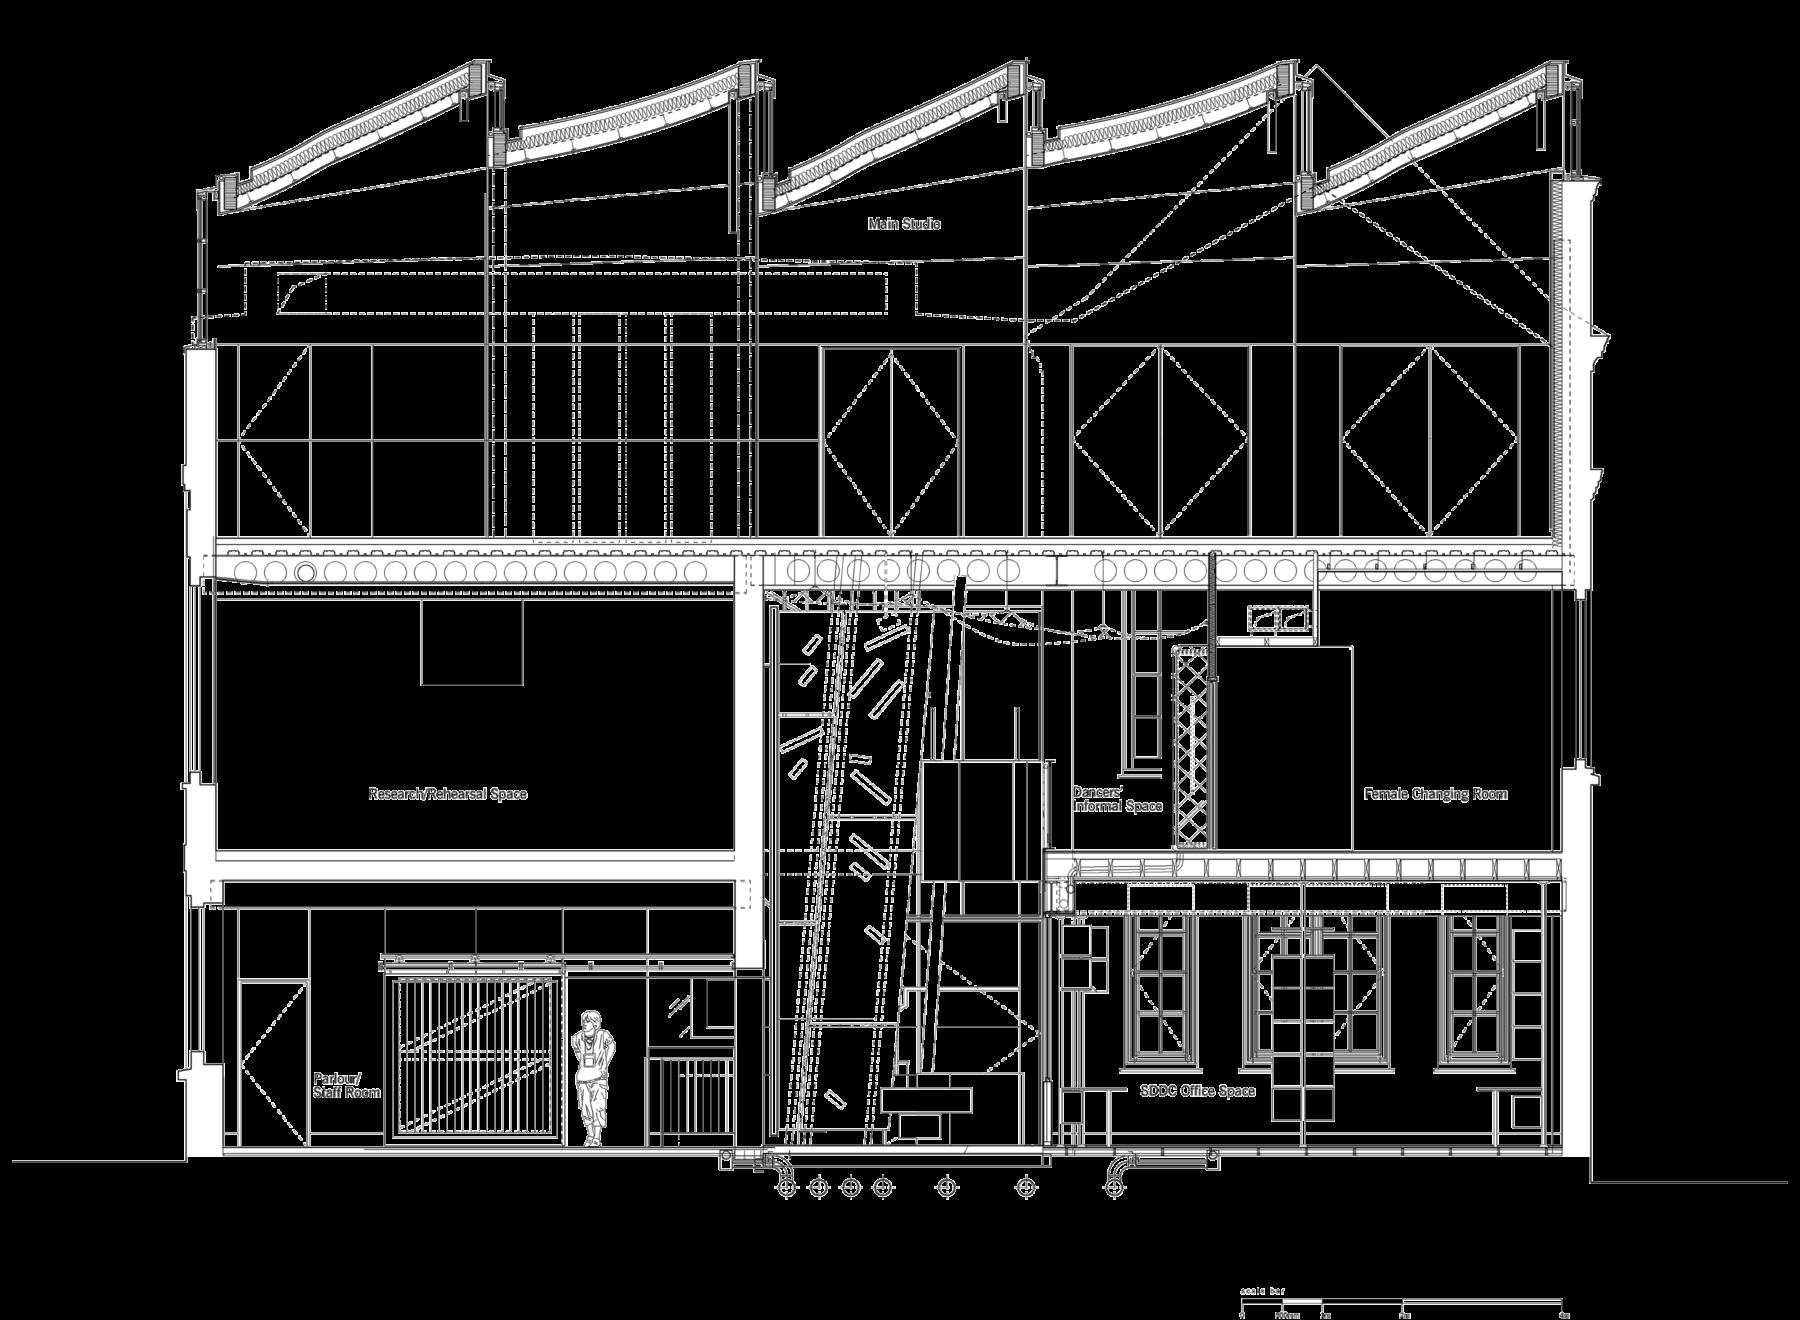 Sarah-Wigglesworth-Architects Siobhan-Davies-Dance Section A 3600